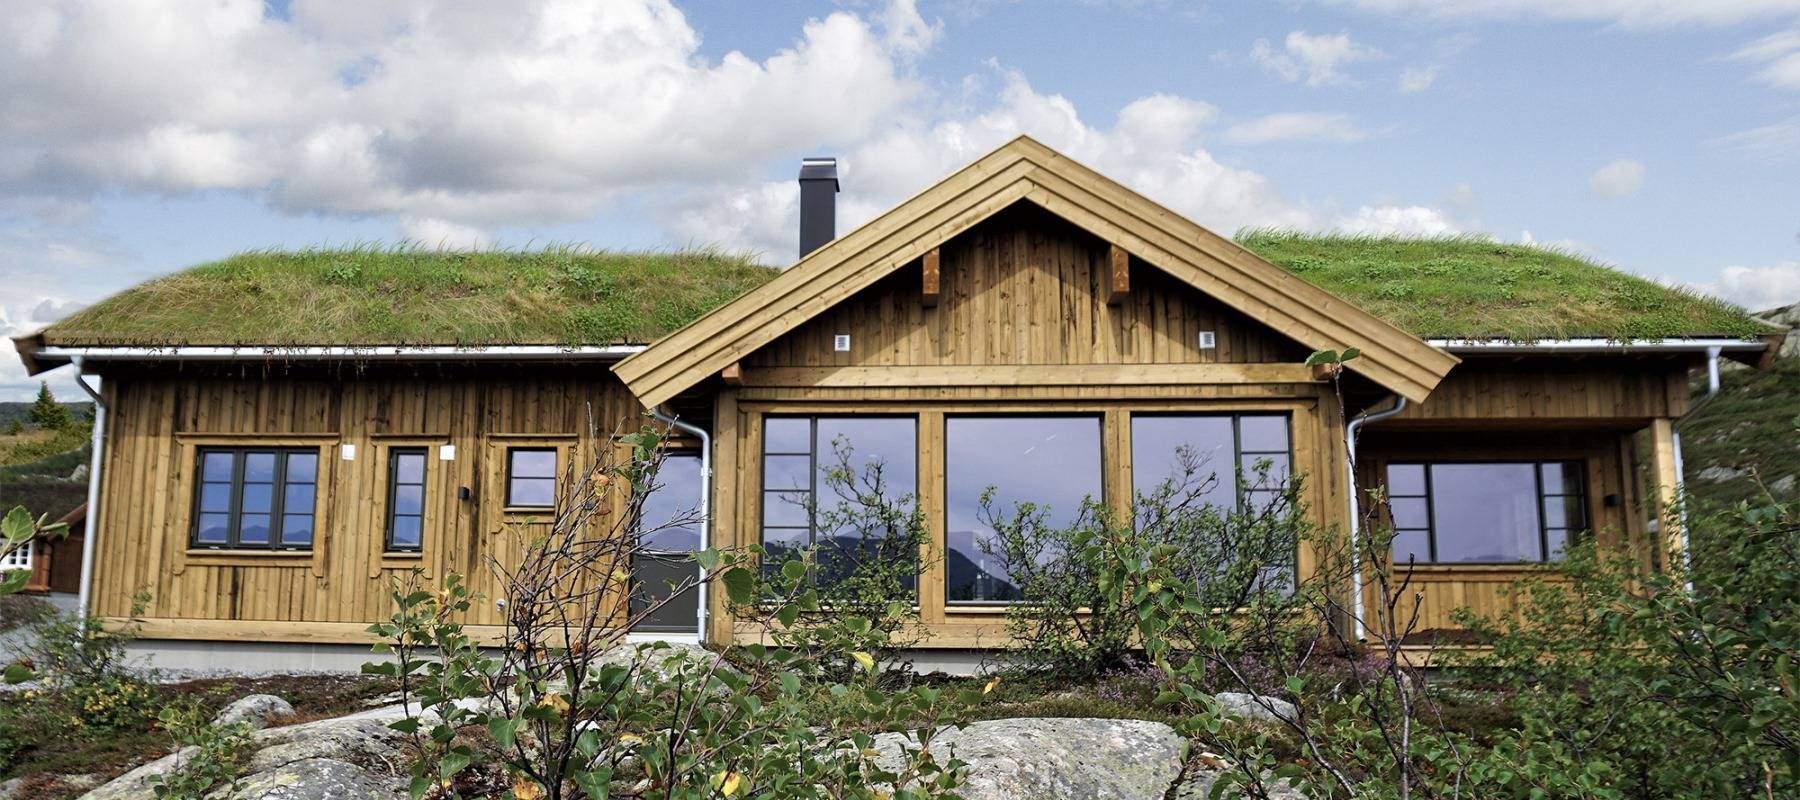 2600 Hytte hytteleverandør Høgevarde 127